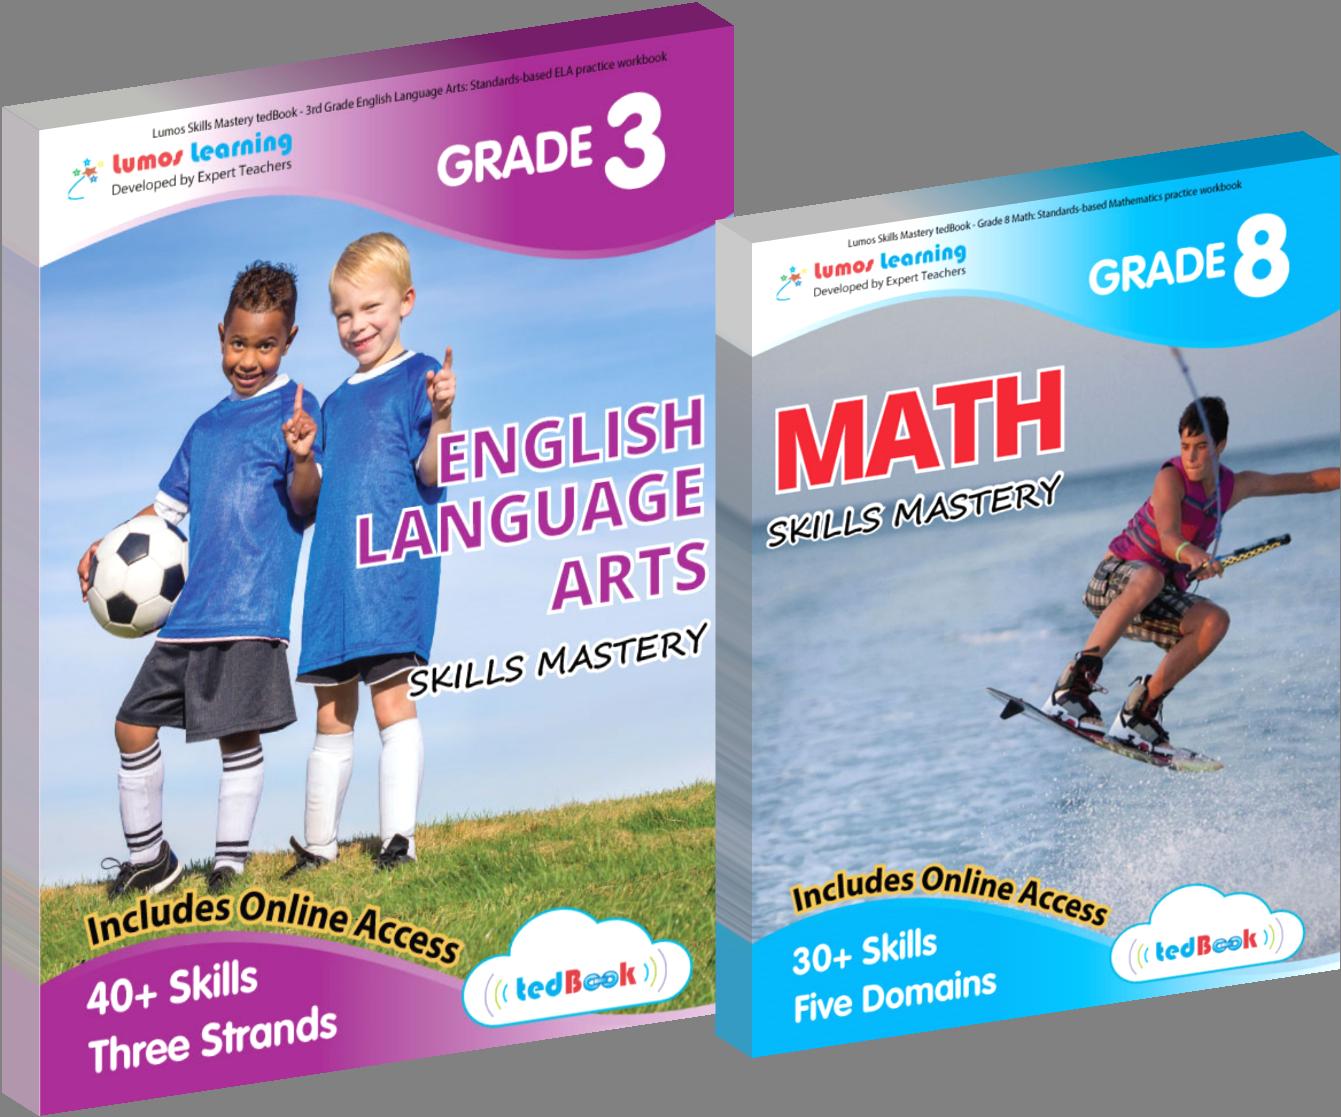 Workbooks Designed to Help Students Master Grade-Level Skills